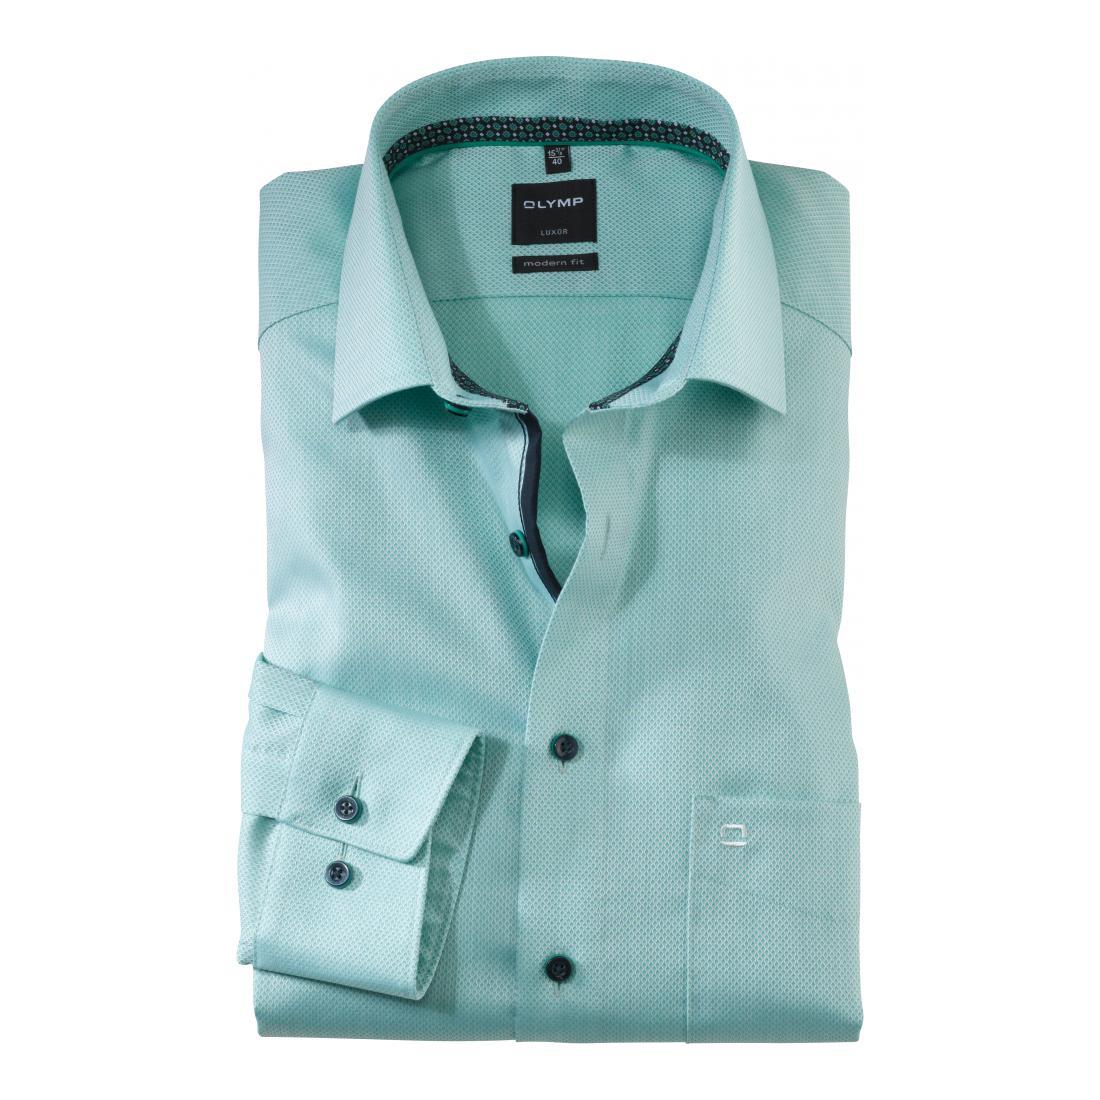 Olymp Business Hemden Herren 1262/74 Hemden